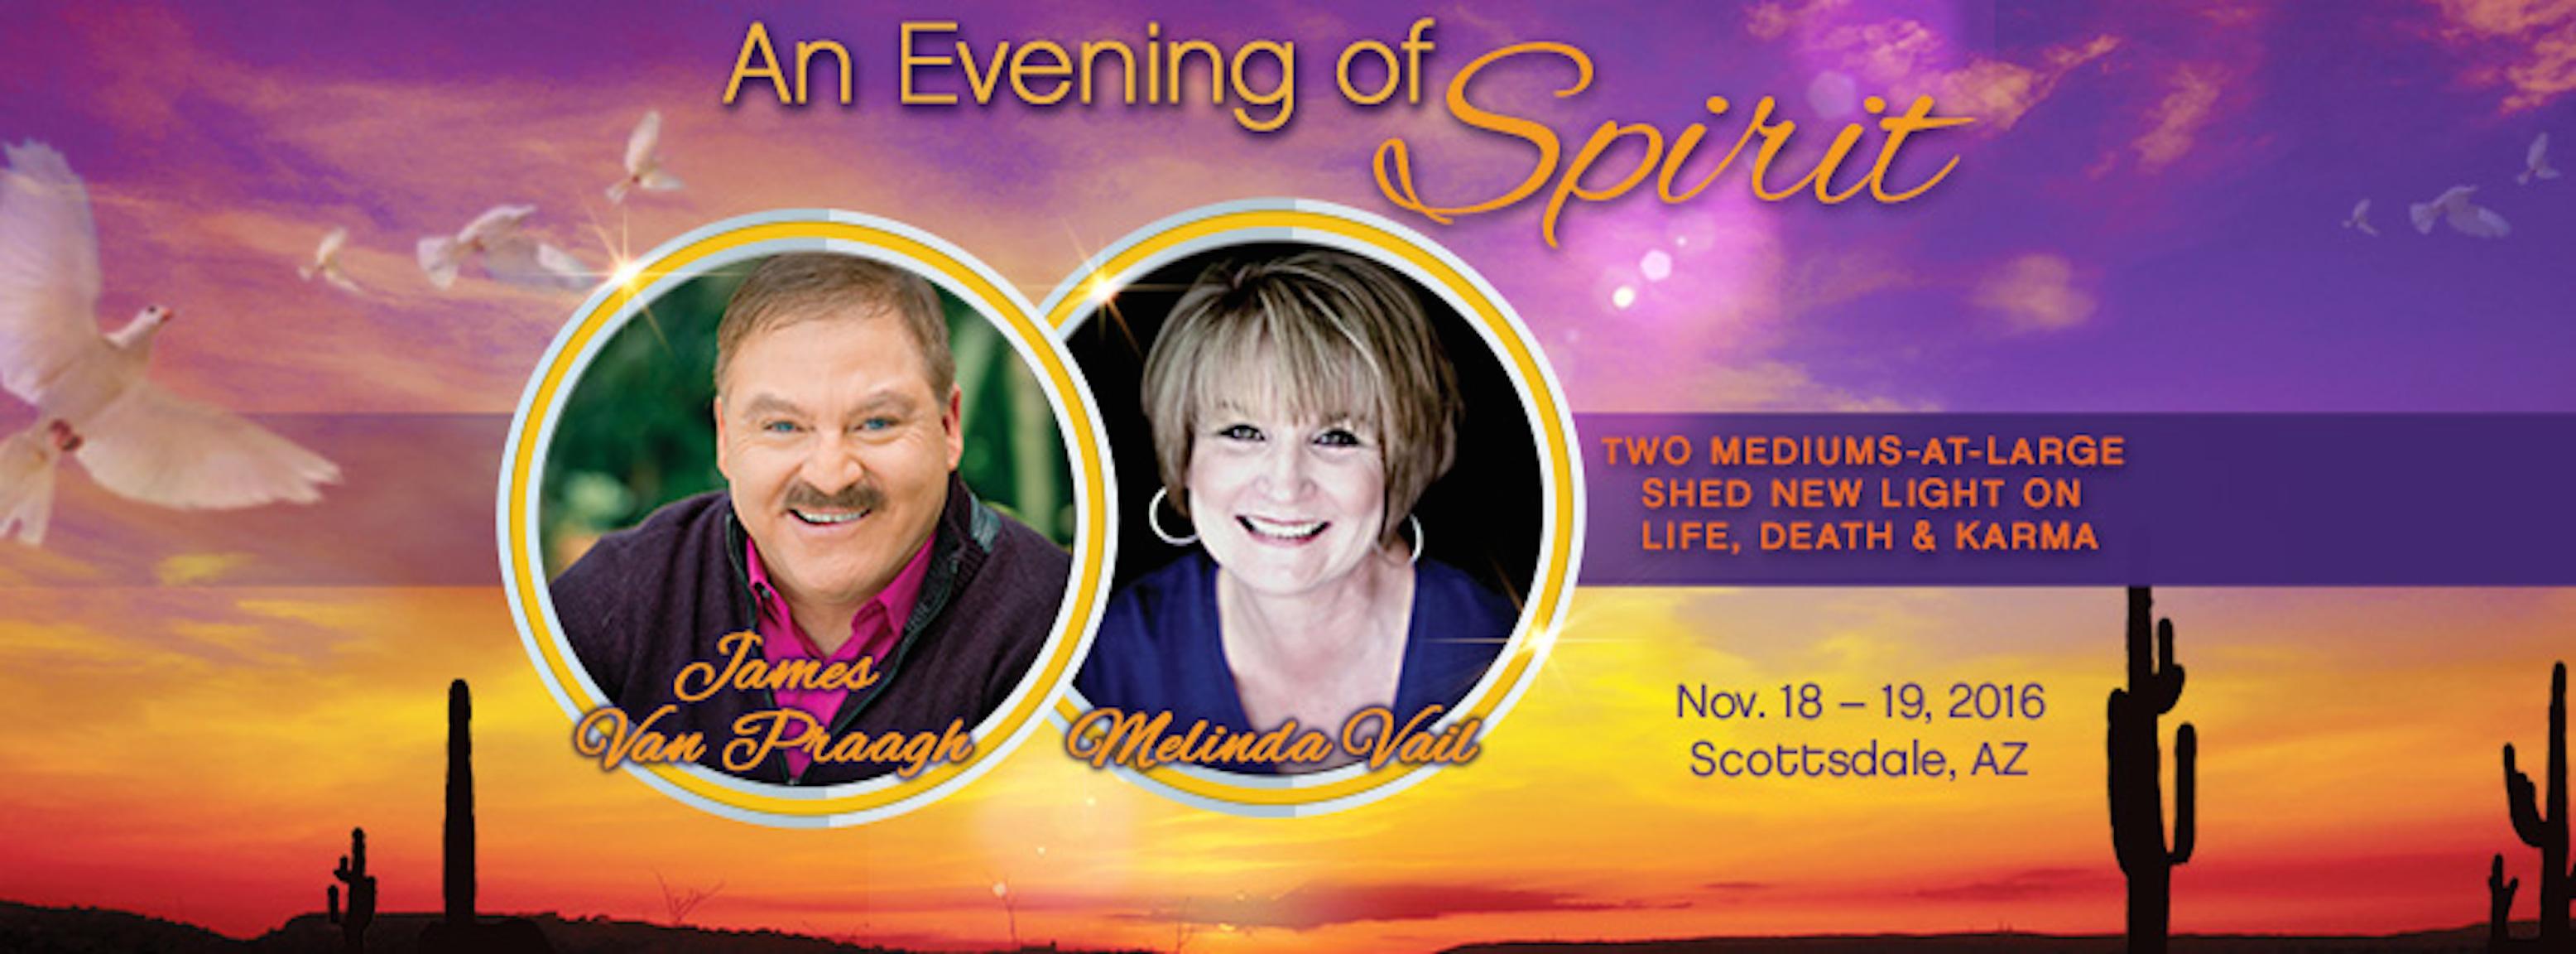 James Van Praagh & Melinda Vail Present an Evening of Spirit & Full Day Workshop banner